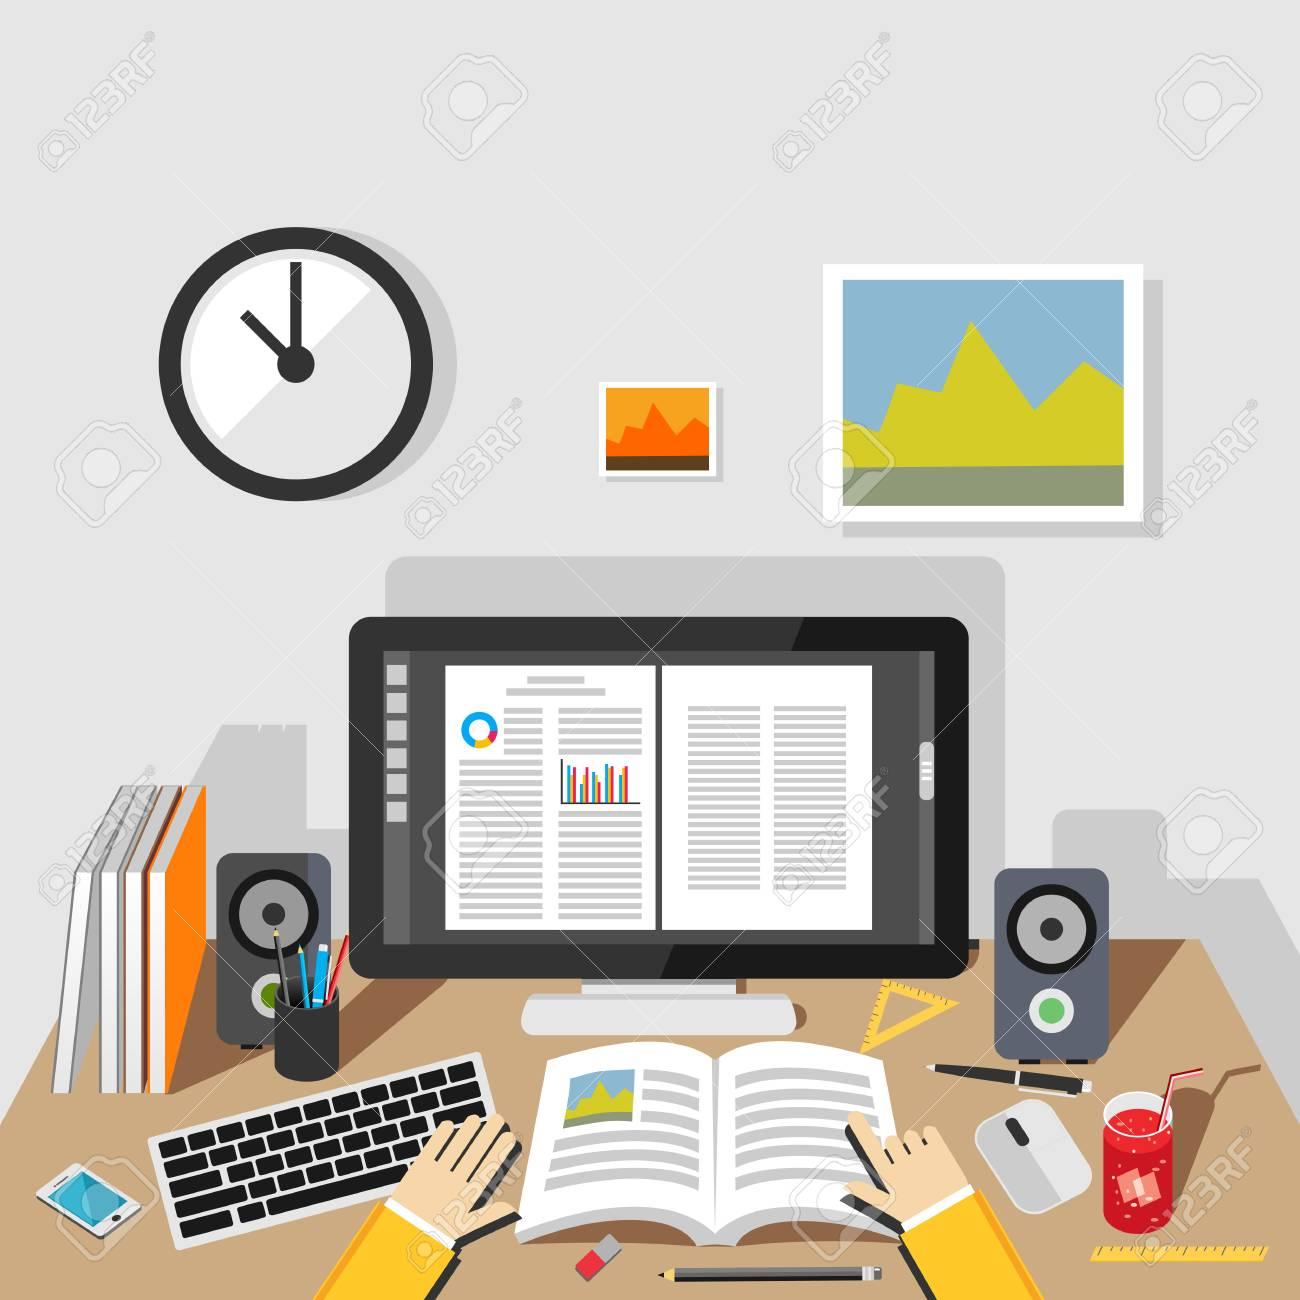 Studying illustration. Studying concept. Flat design illustration concepts for studying, working, reading, analysis, planning, writing, development, brainstorming. - 44040246